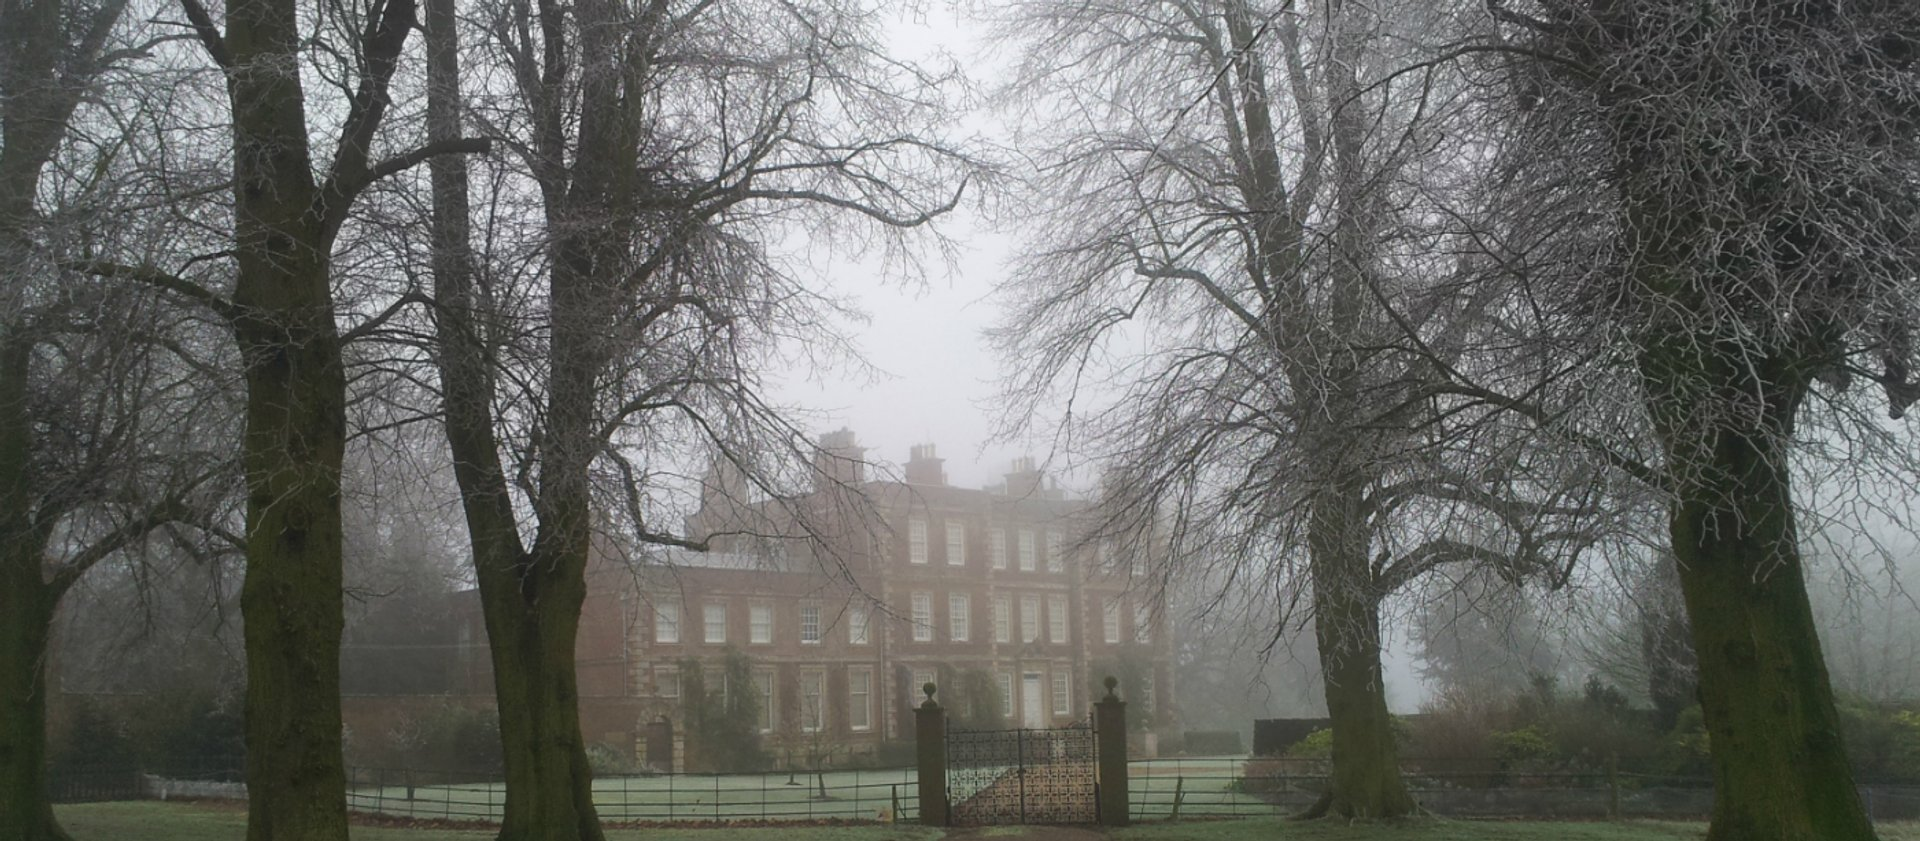 Gunby Hall -  Source